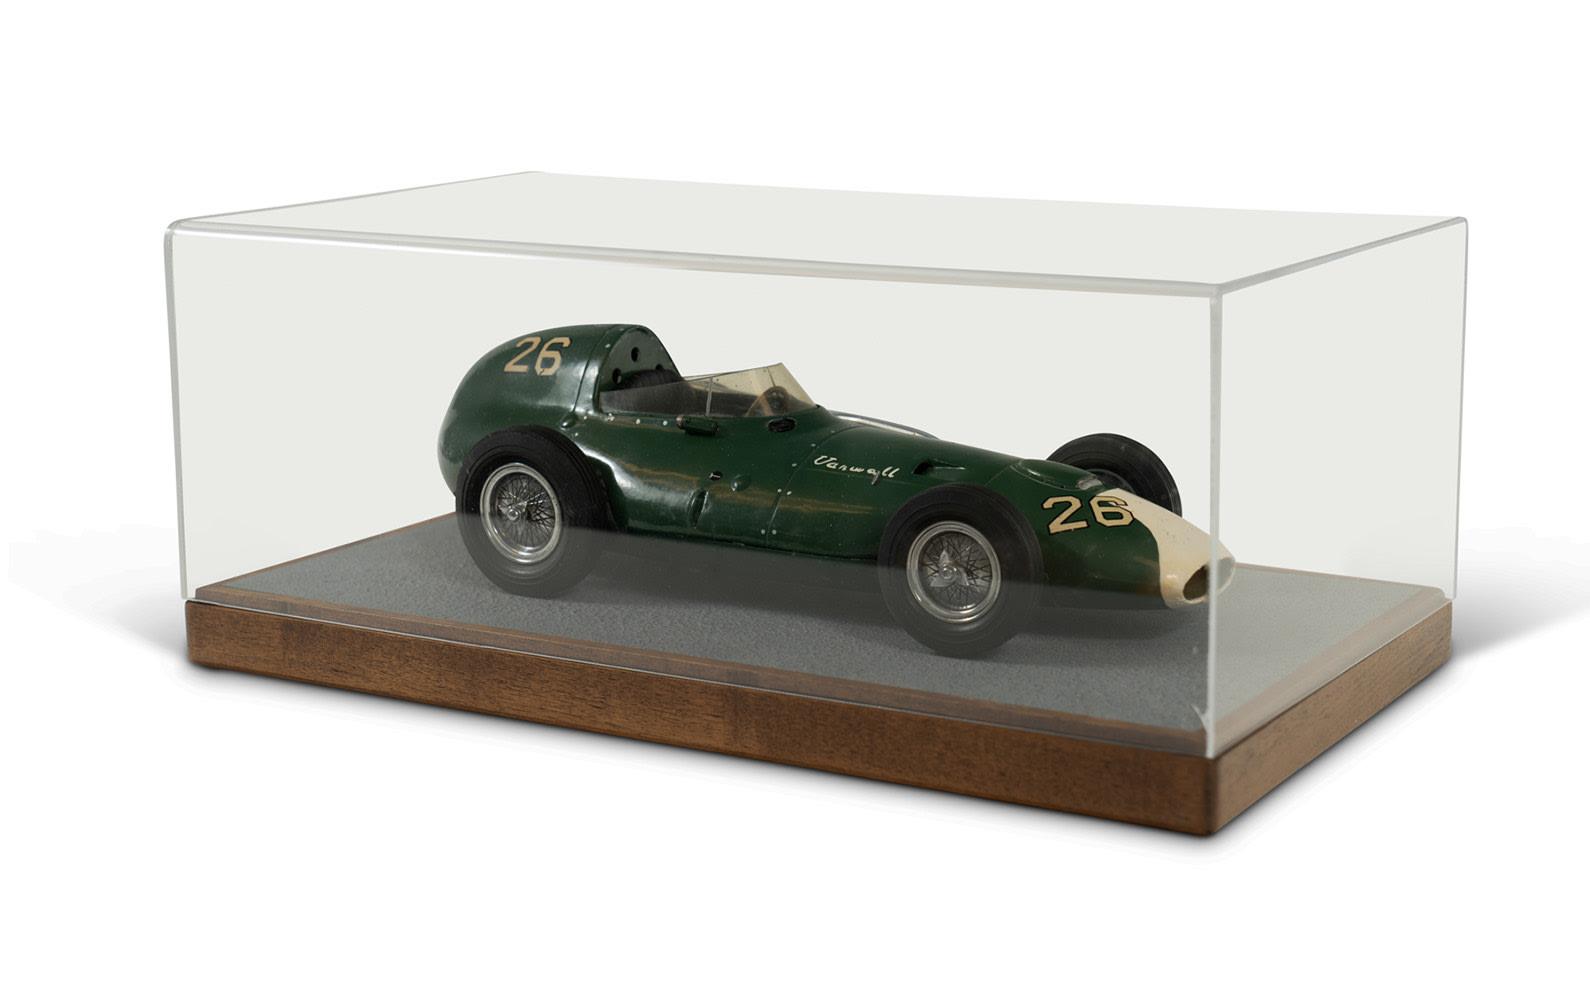 1958 Vanwall VW5 Grand Prix Model By Michele Conti